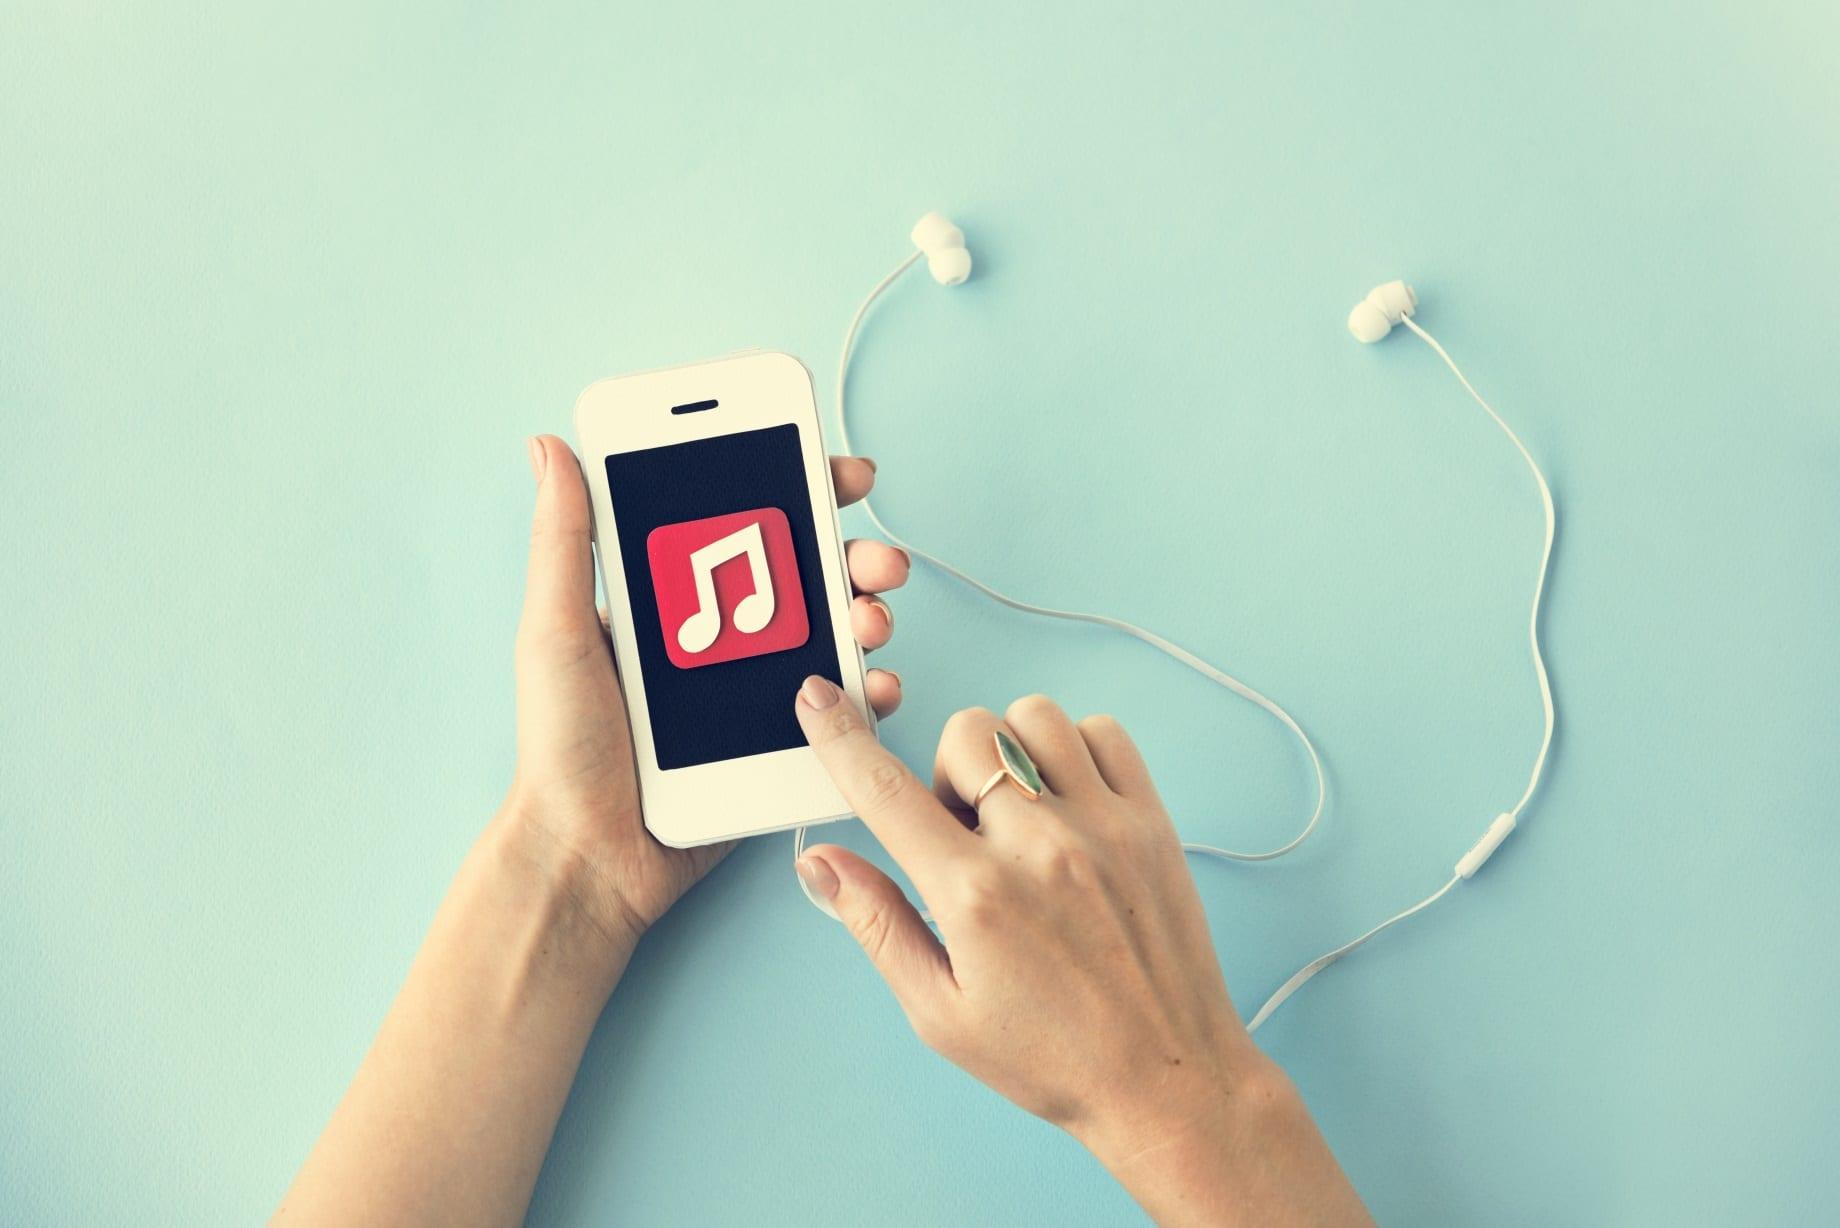 Plan a playlist